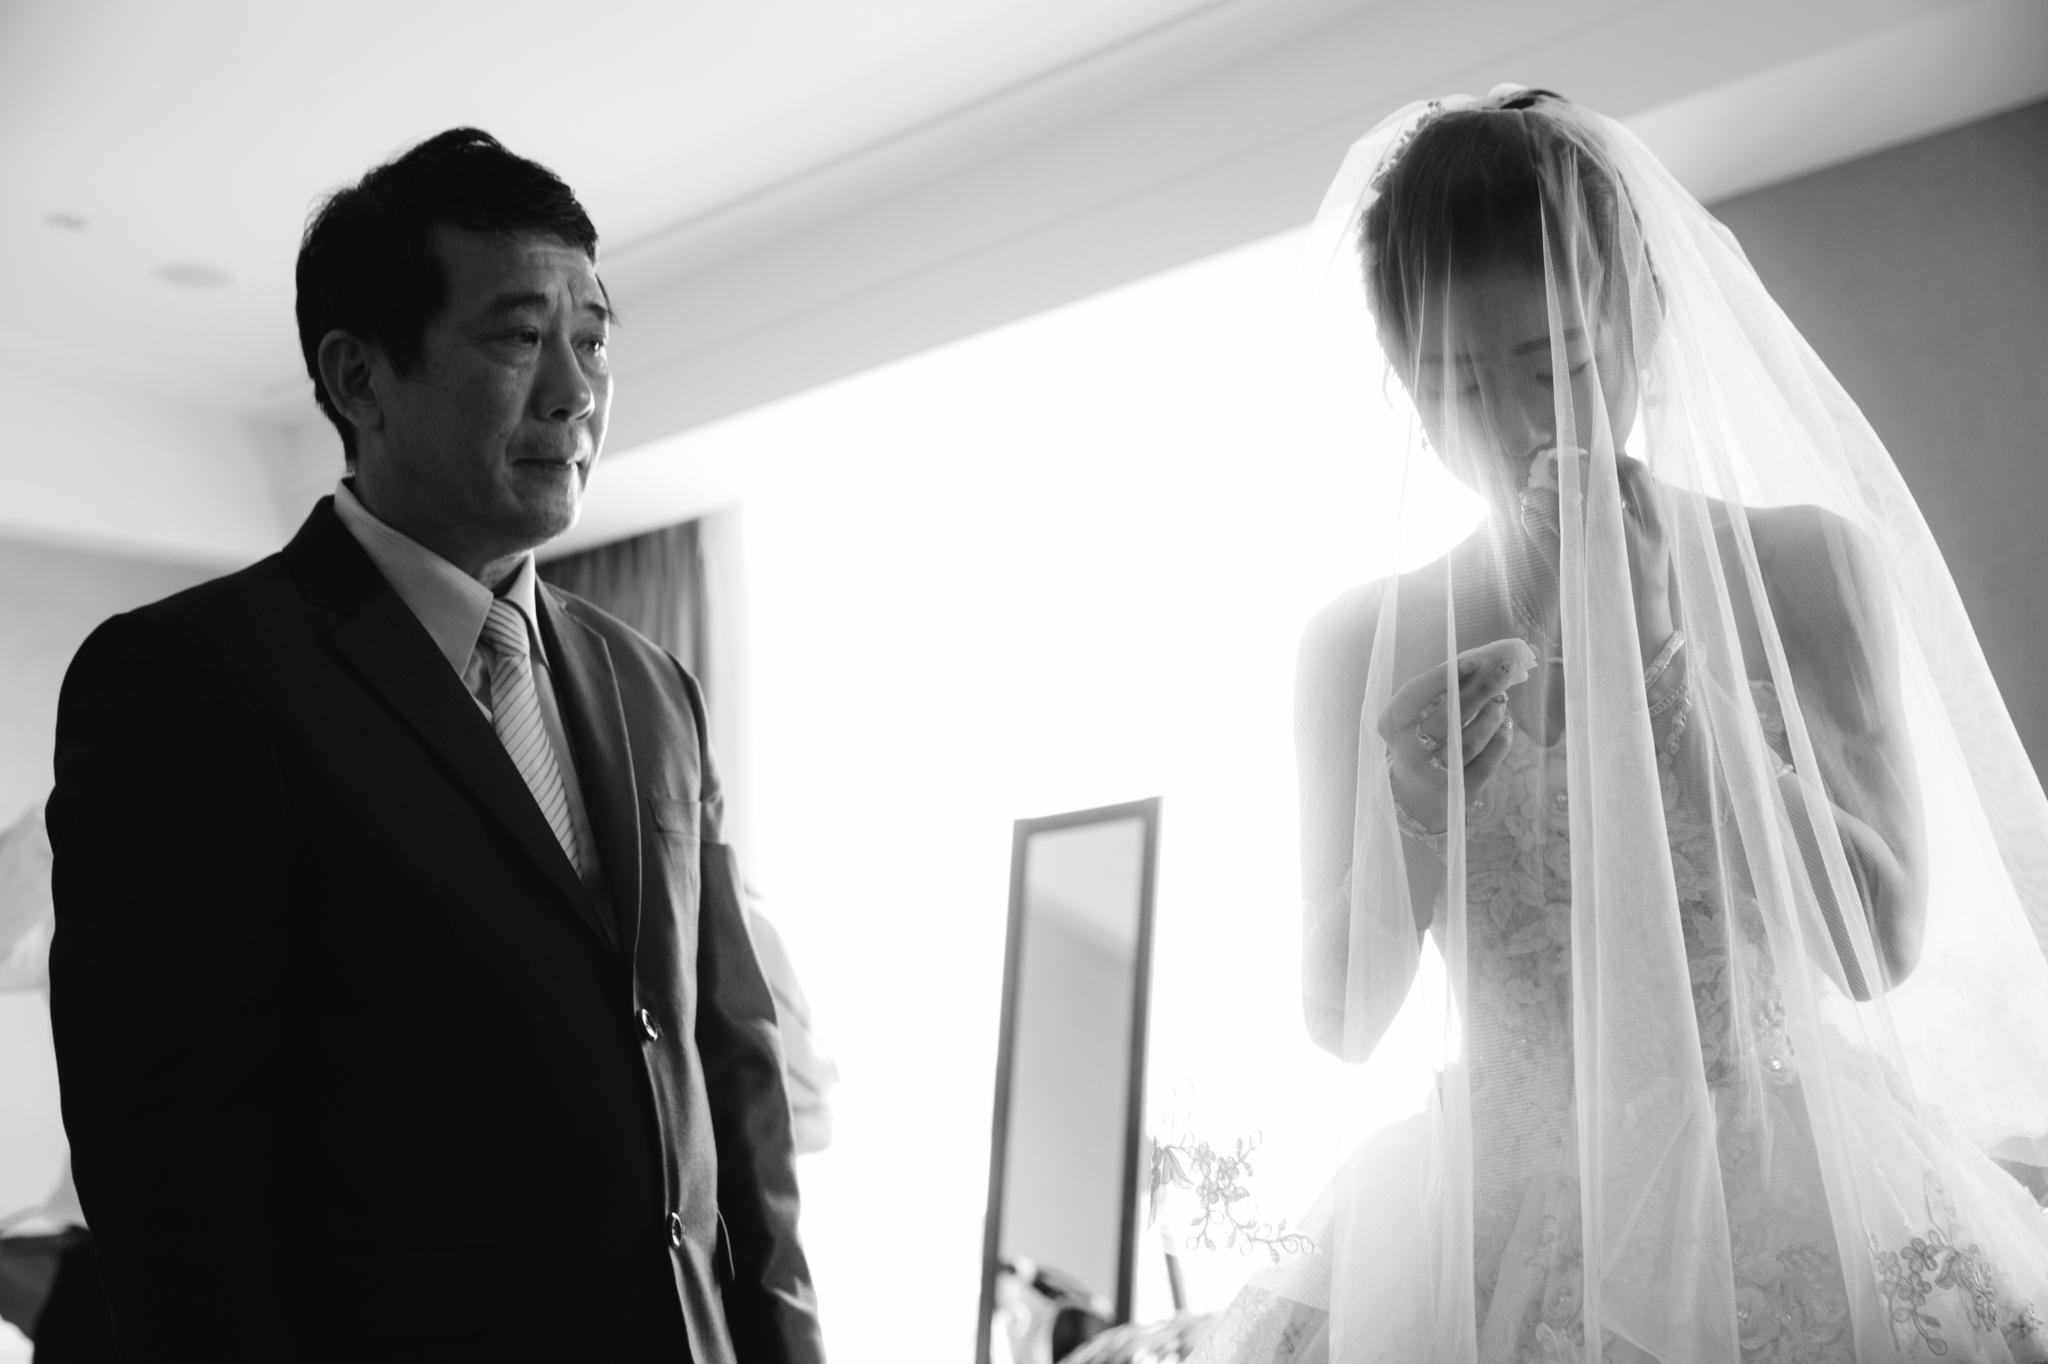 Tina+Nash-wedding-台北婚禮迎娶晚宴-新莊終身大事-070.jpg